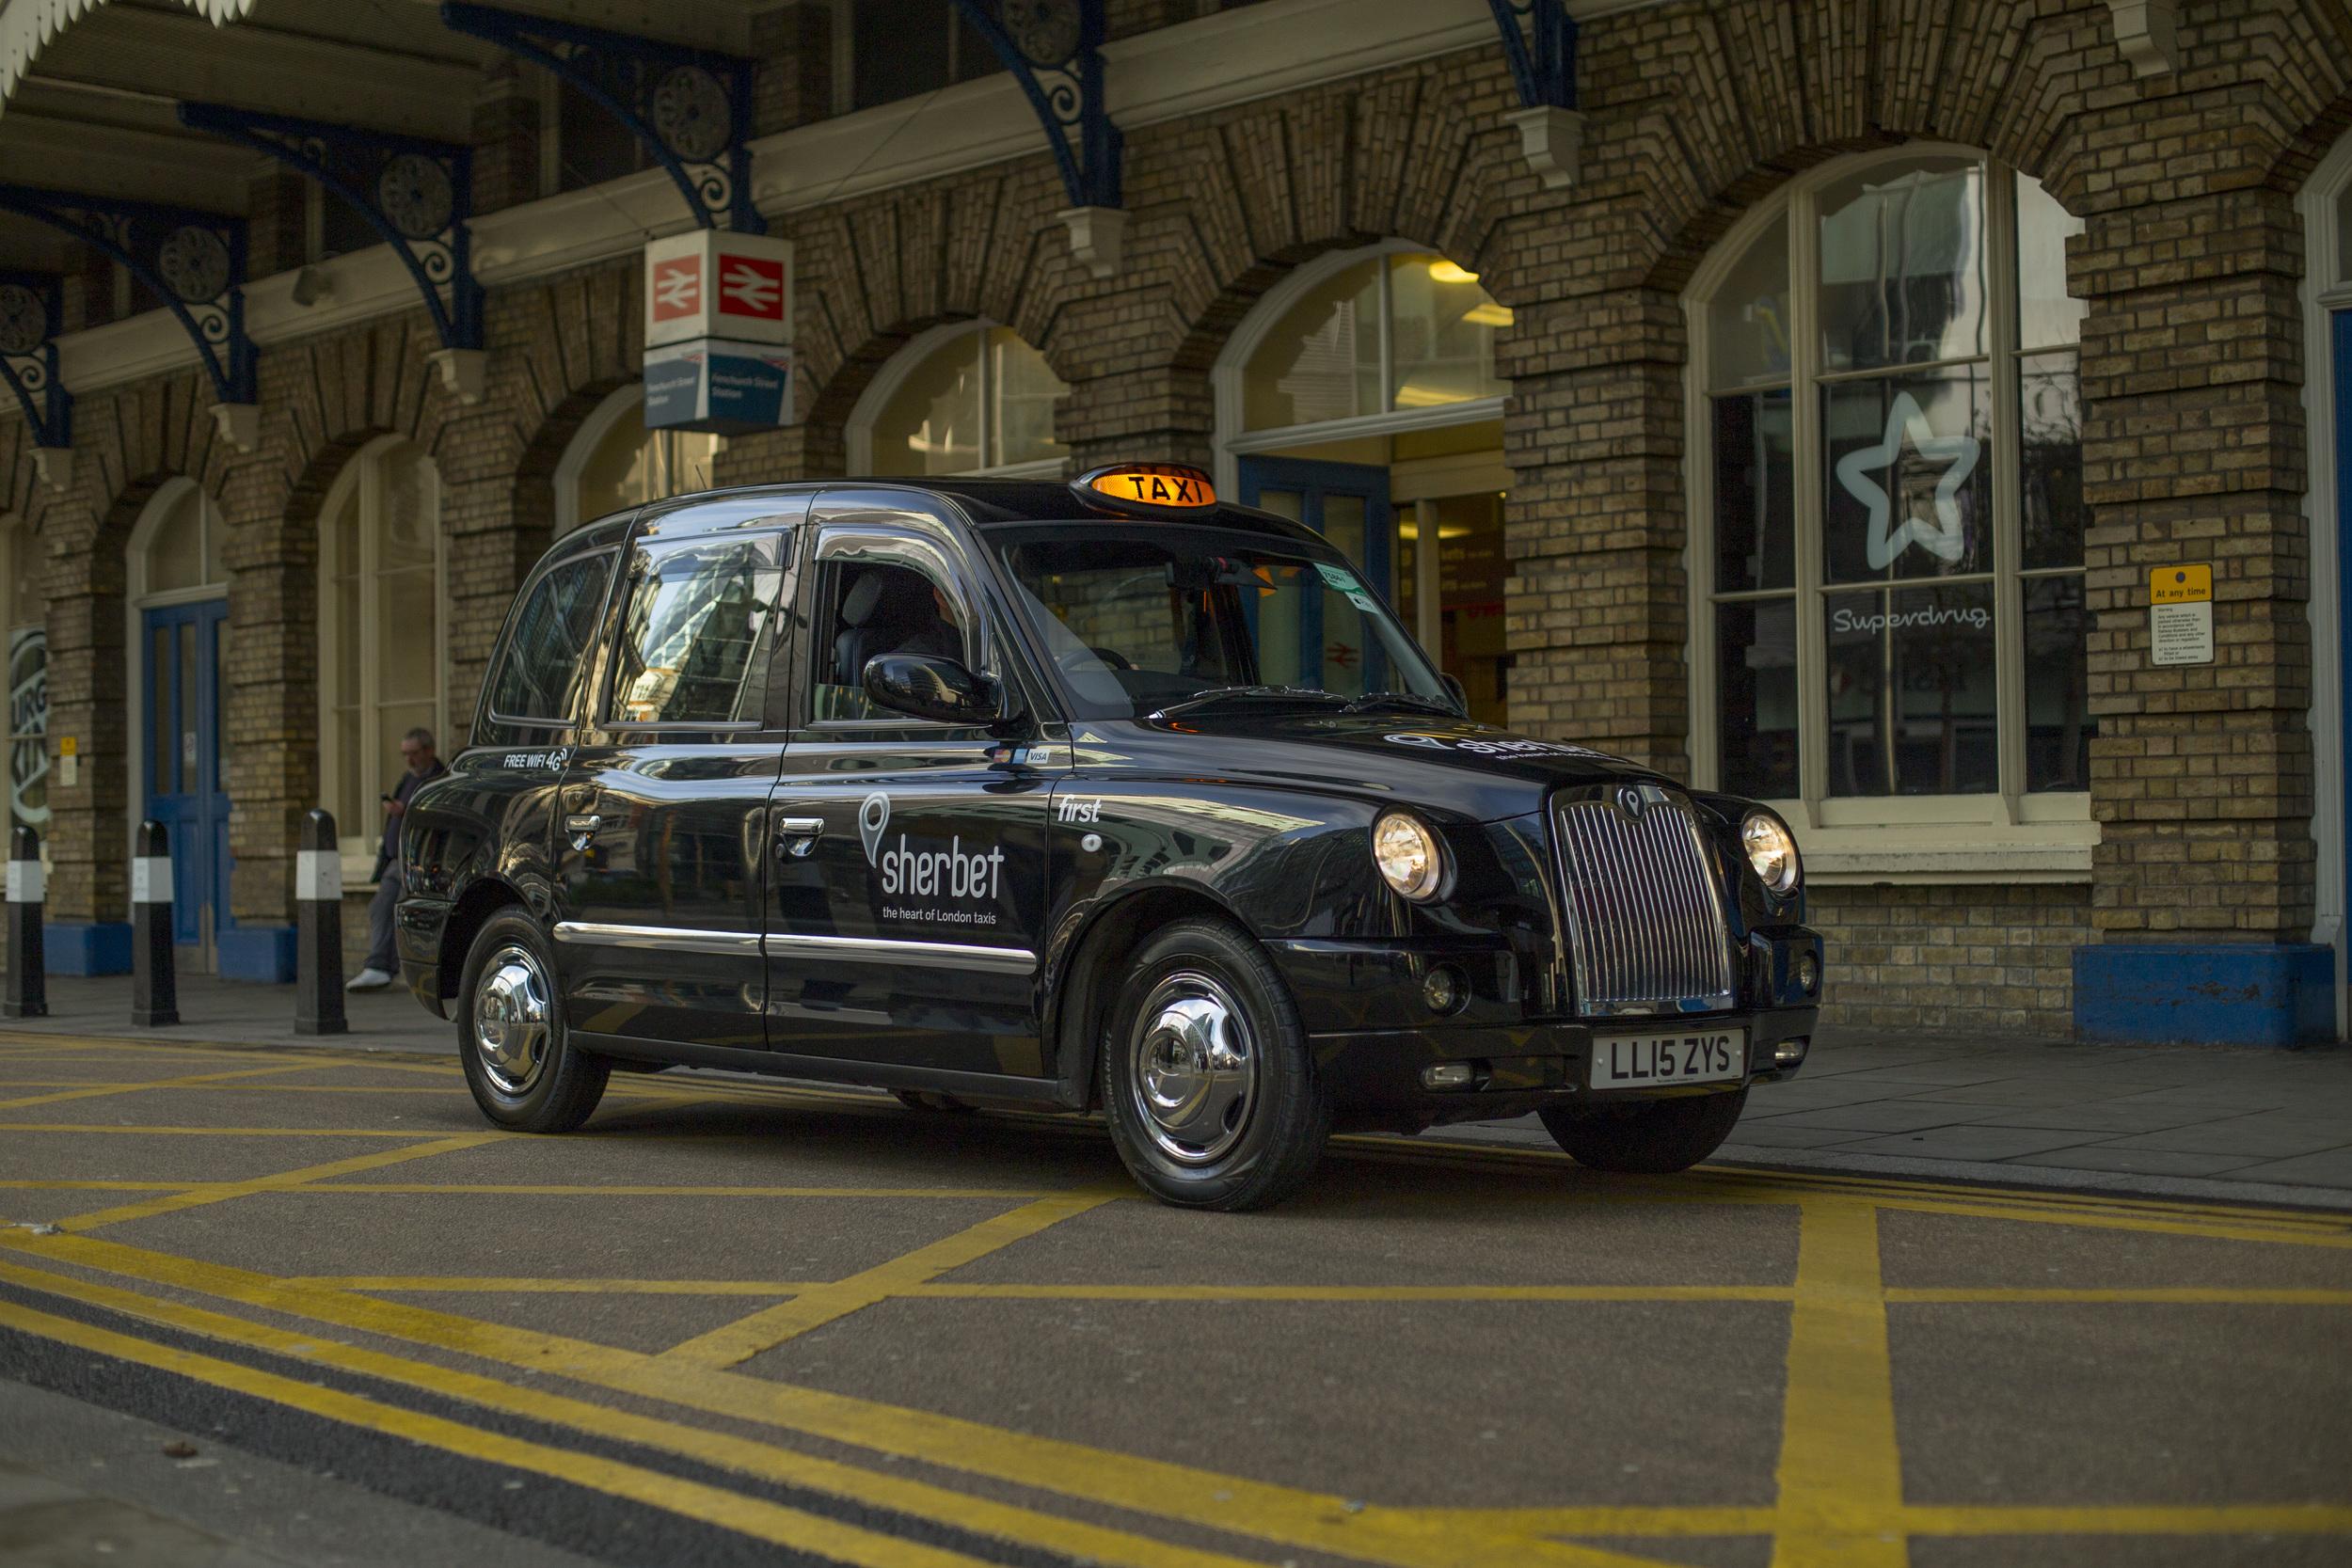 Sherbet London Taxis